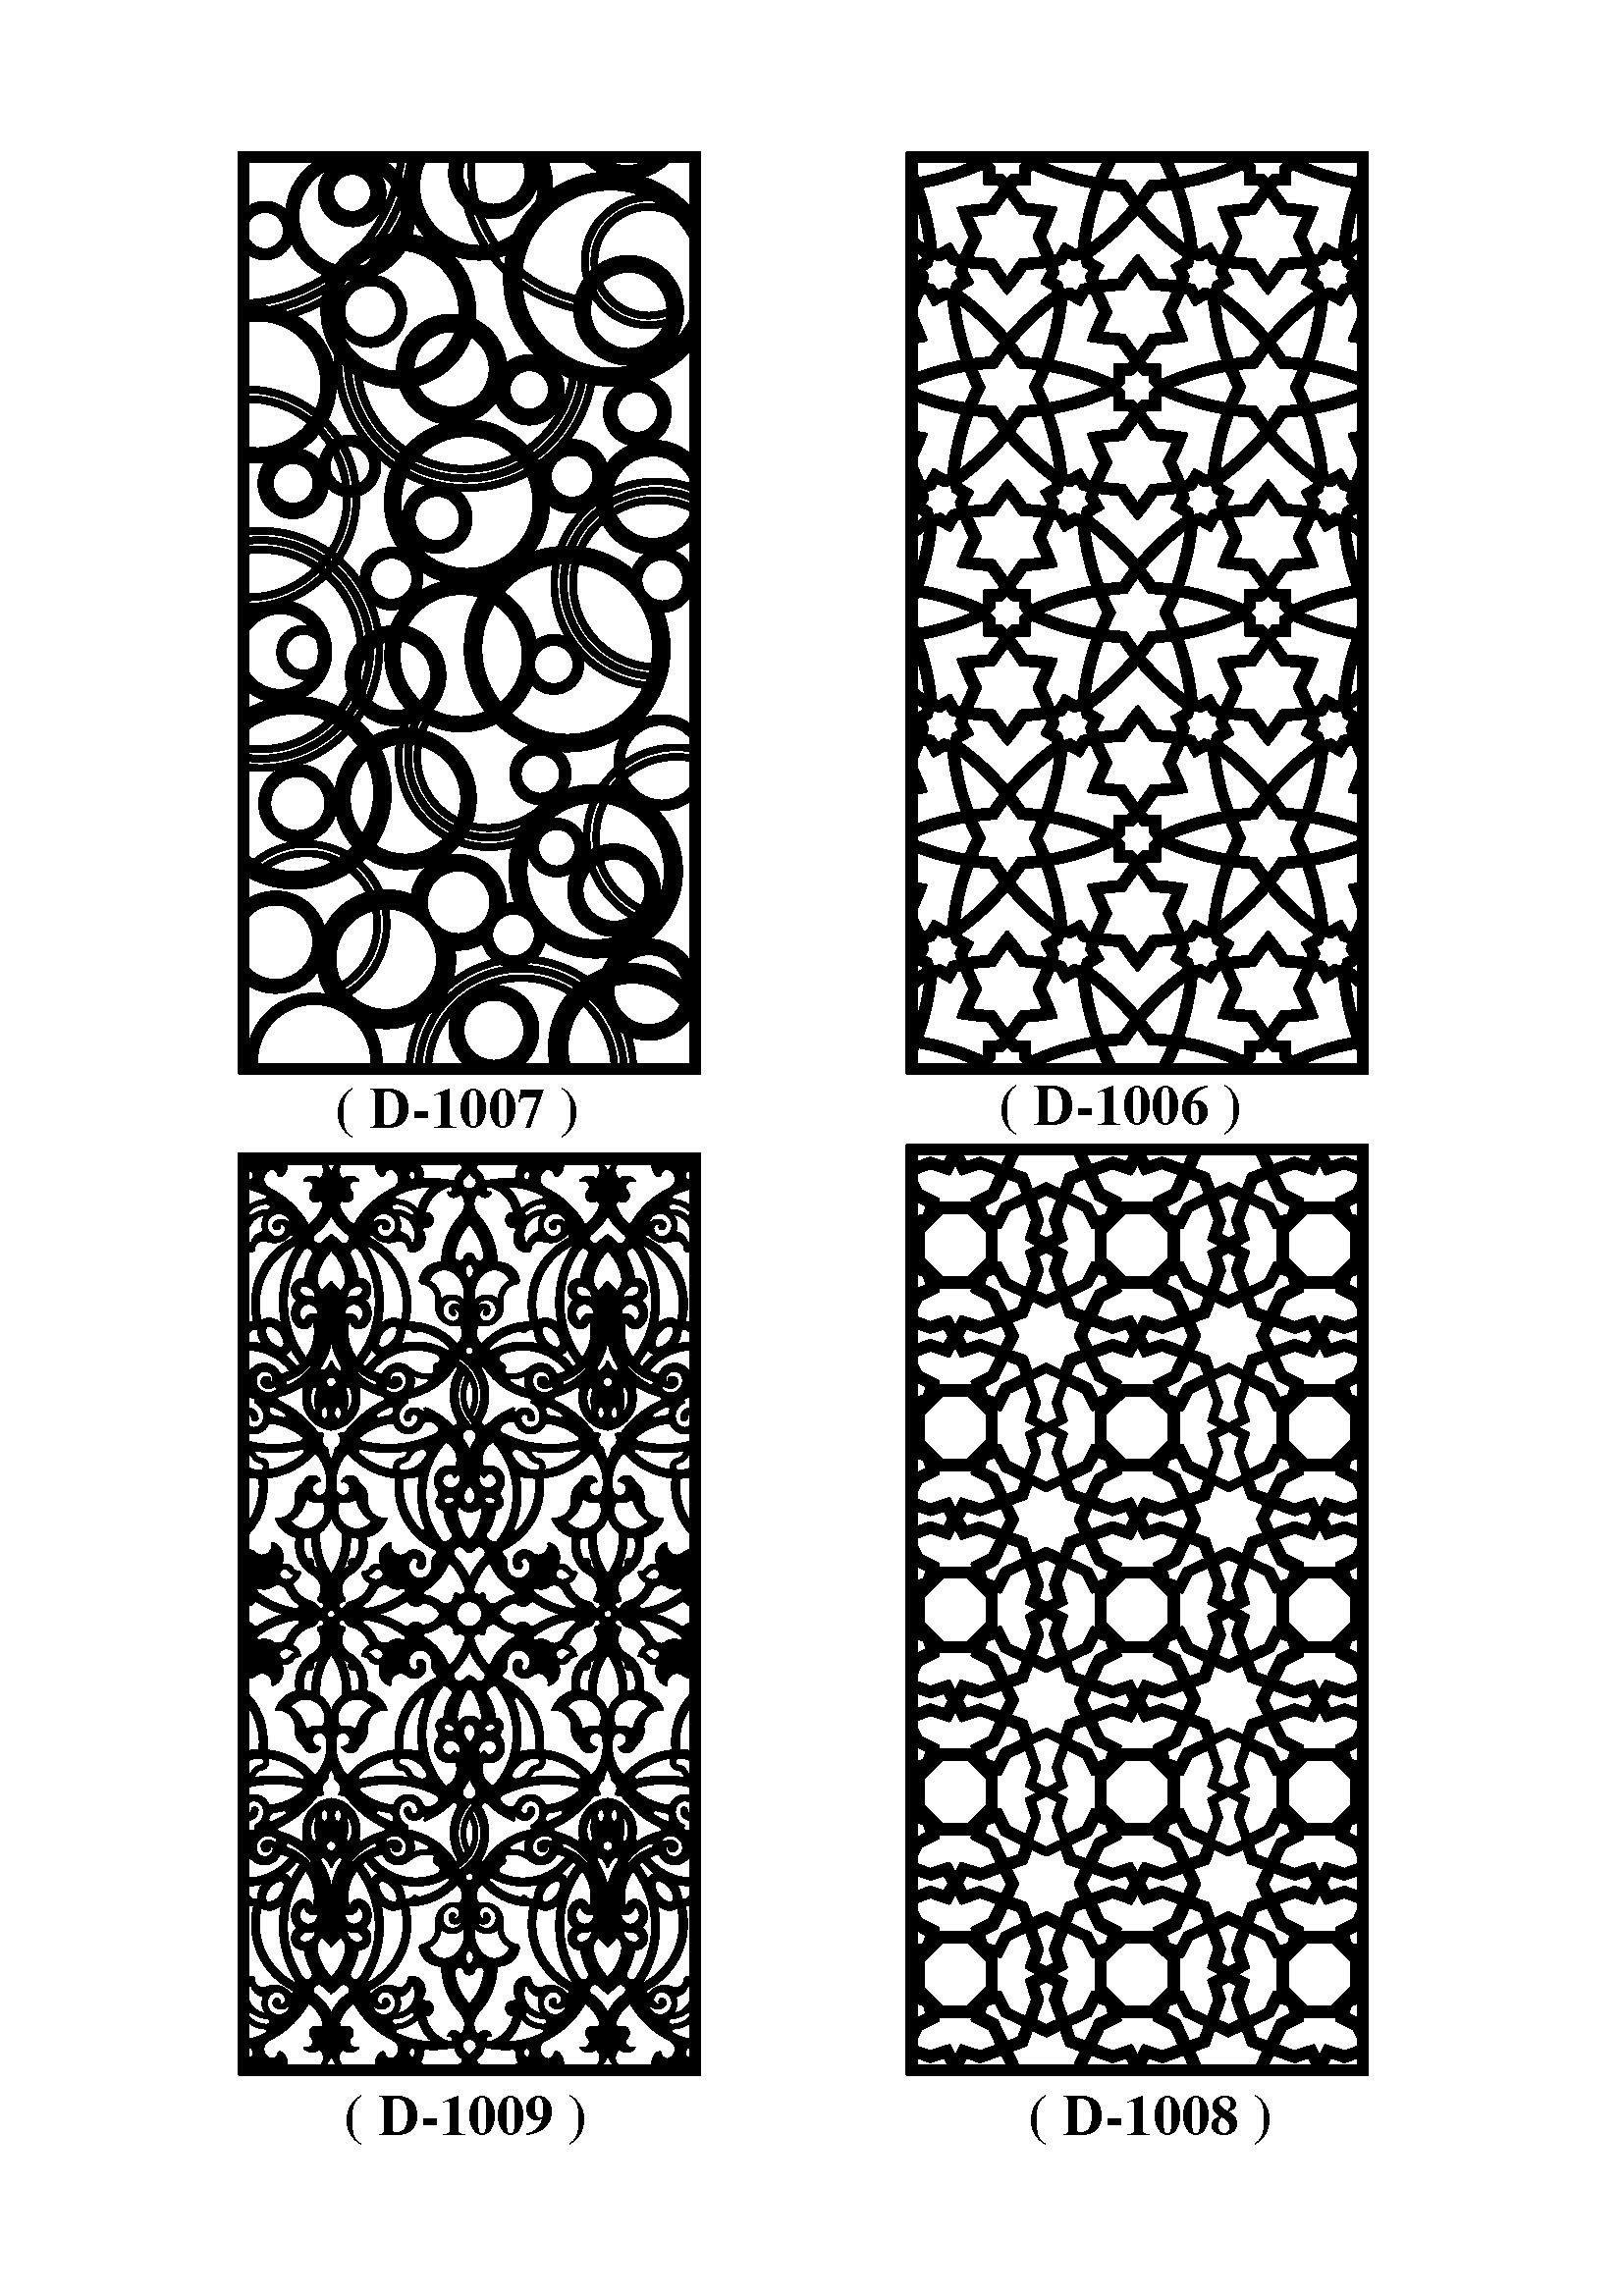 Fimco jeddah laser cut | DOORS in 2019 | Laser cut patterns